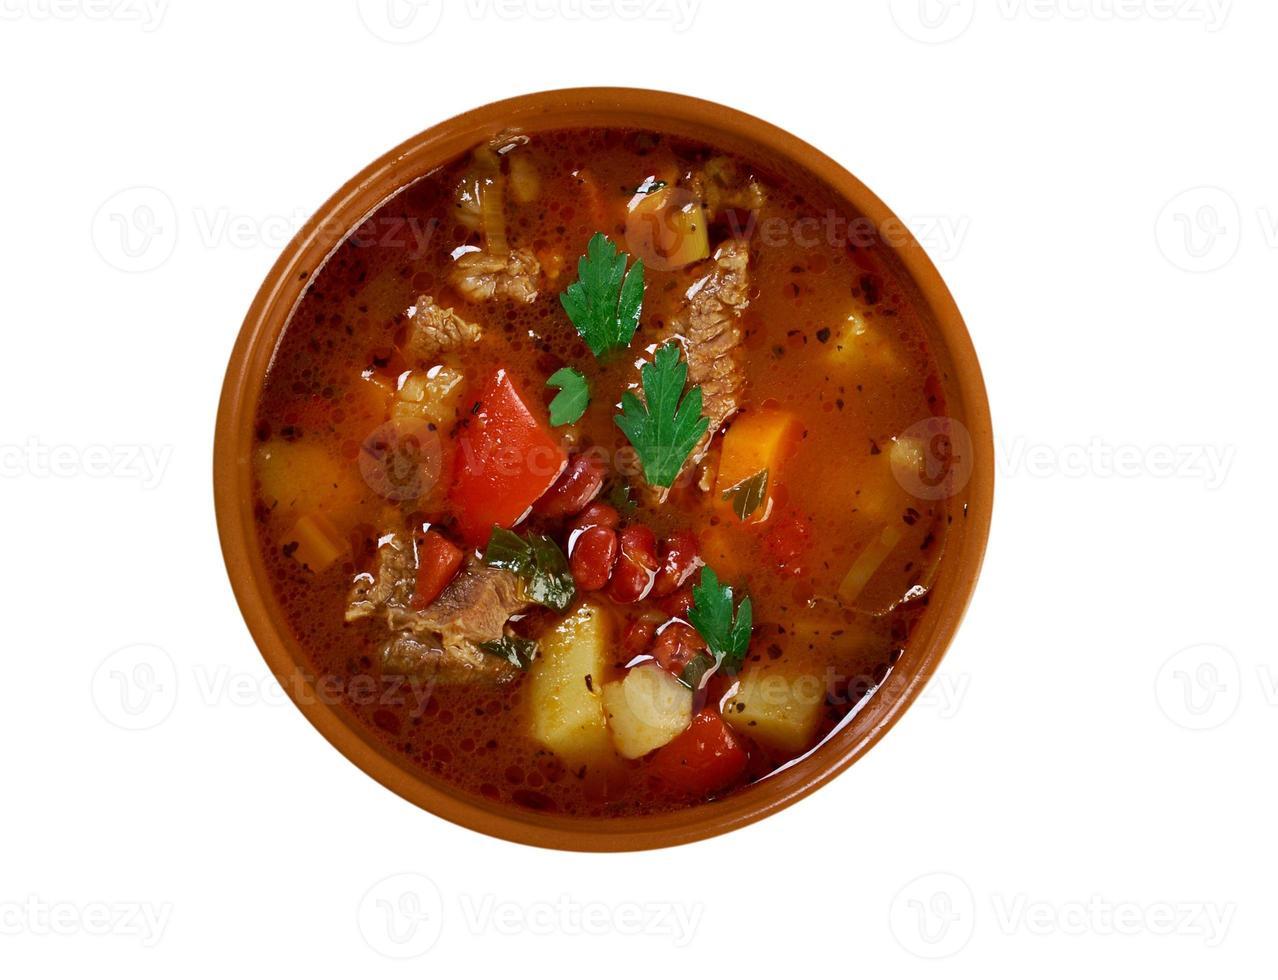 eintopf - traditionele Duitse gerechten. foto